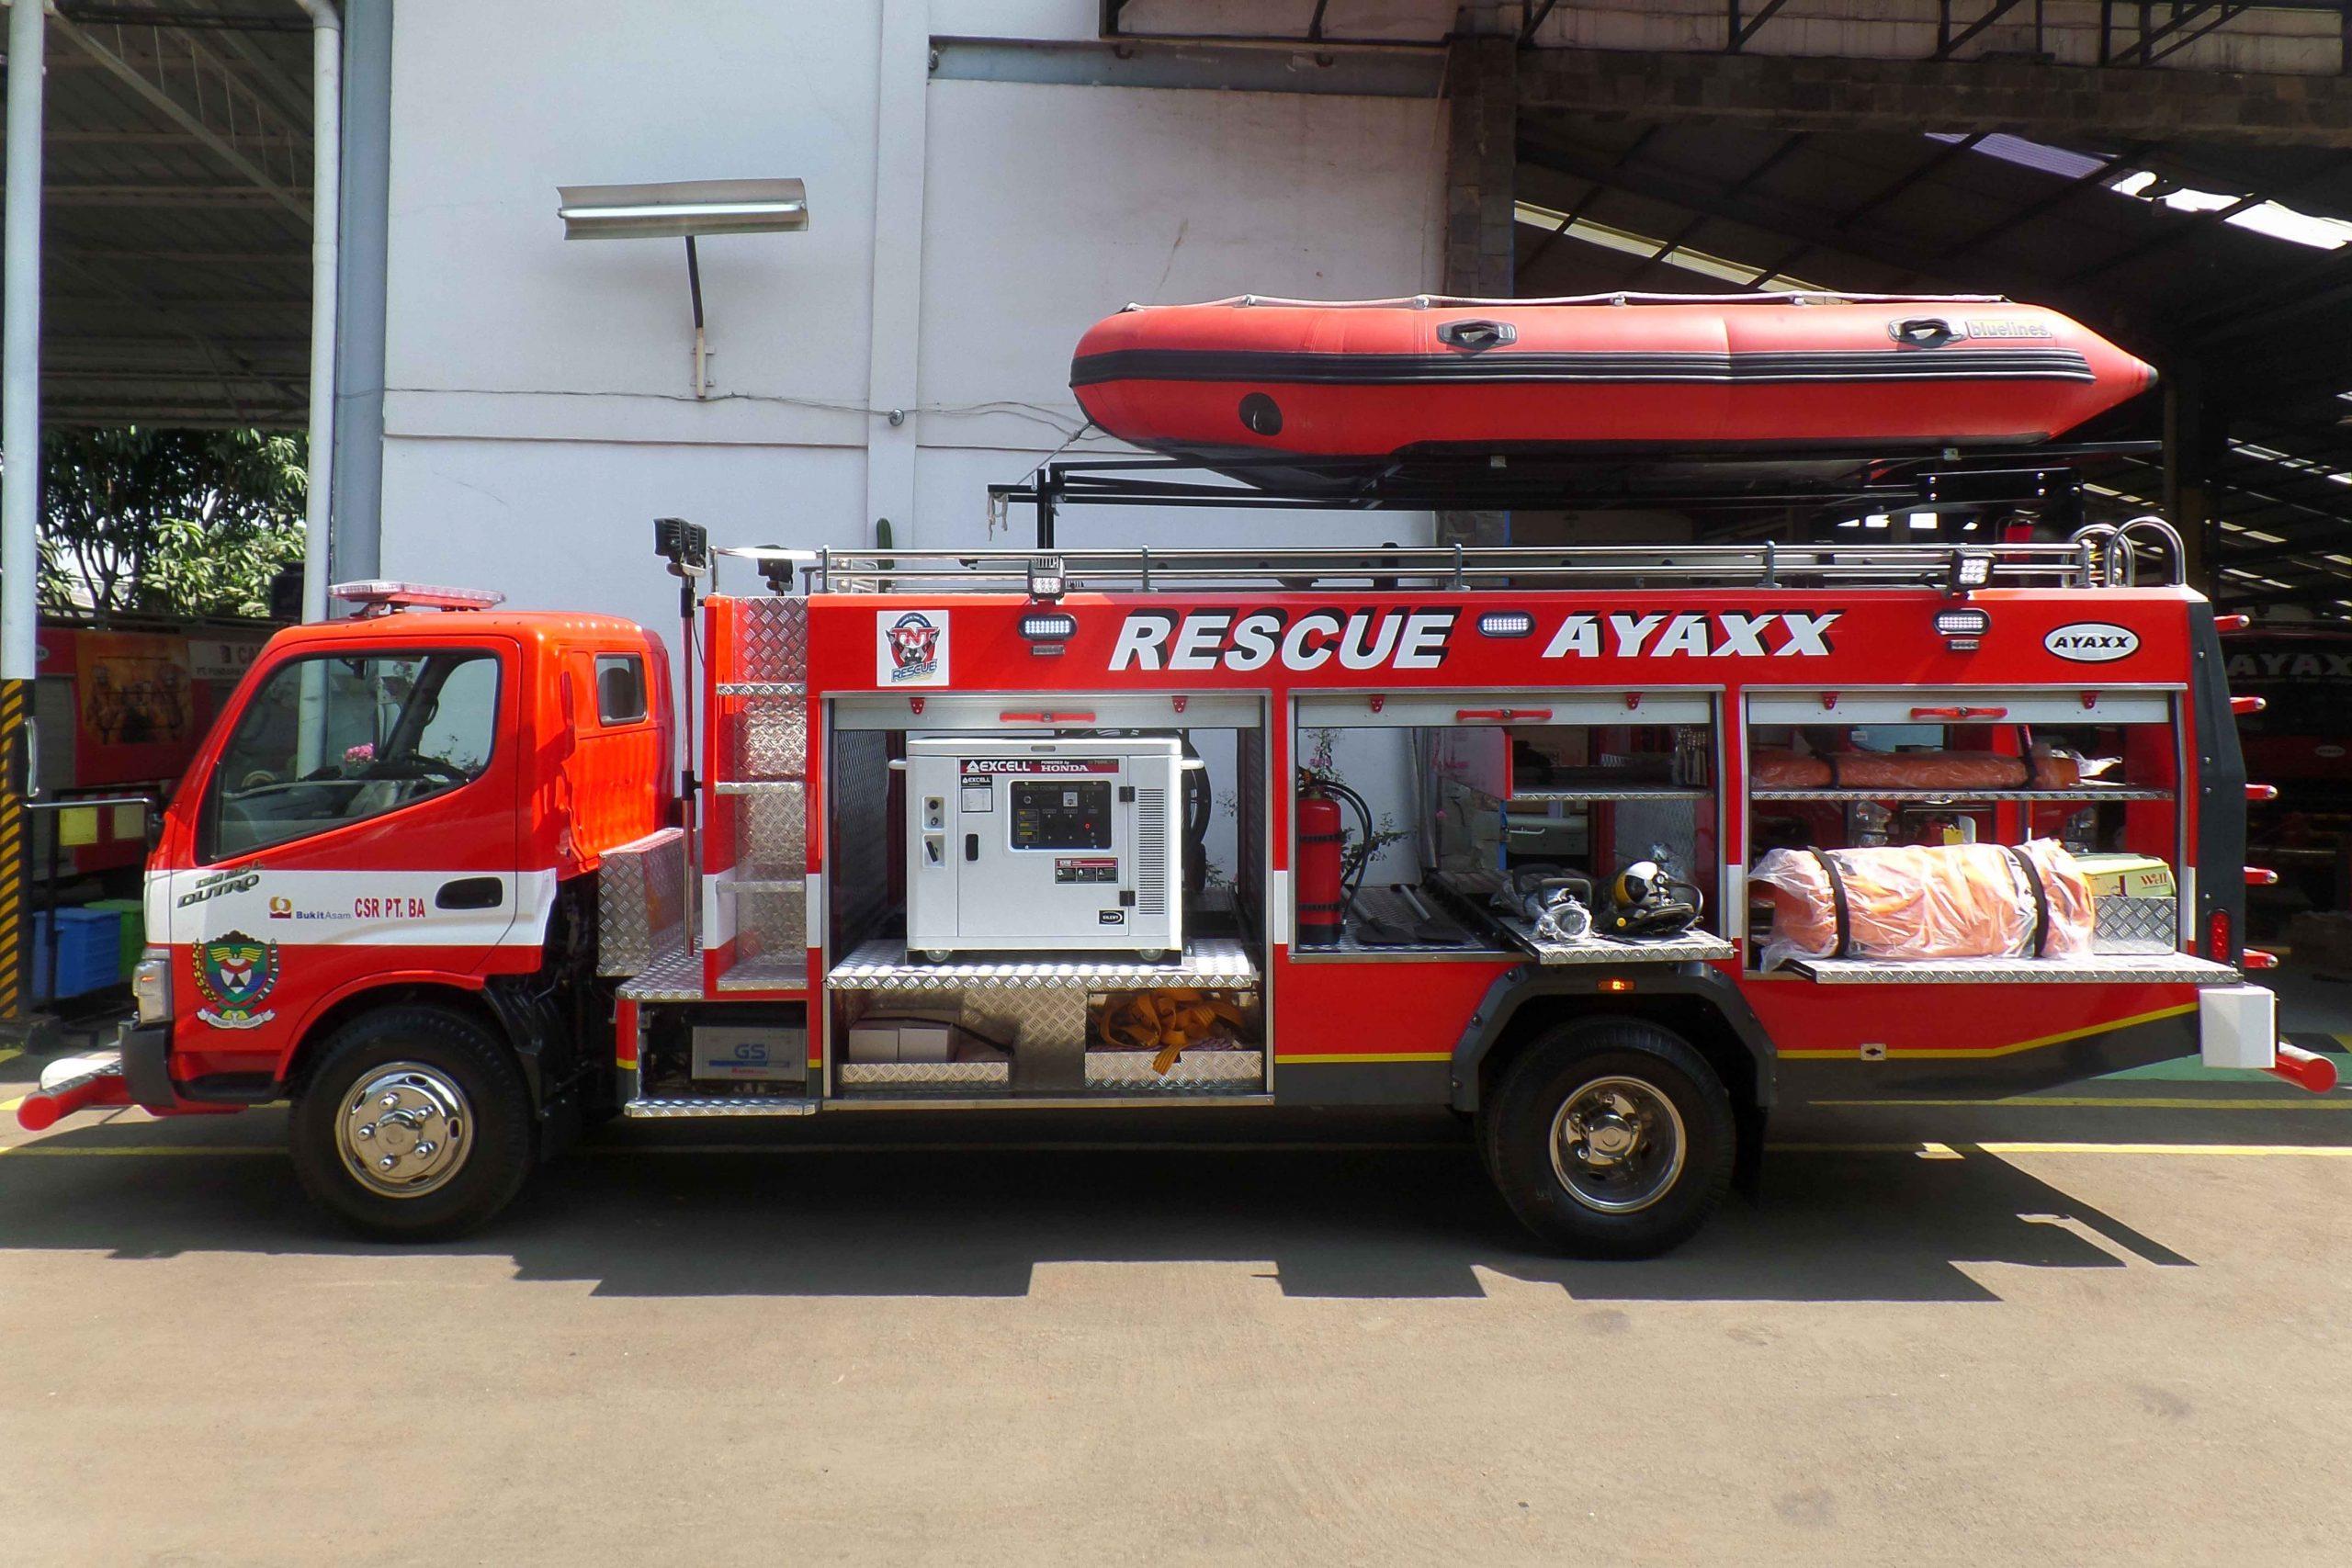 ayaxx rescue truck